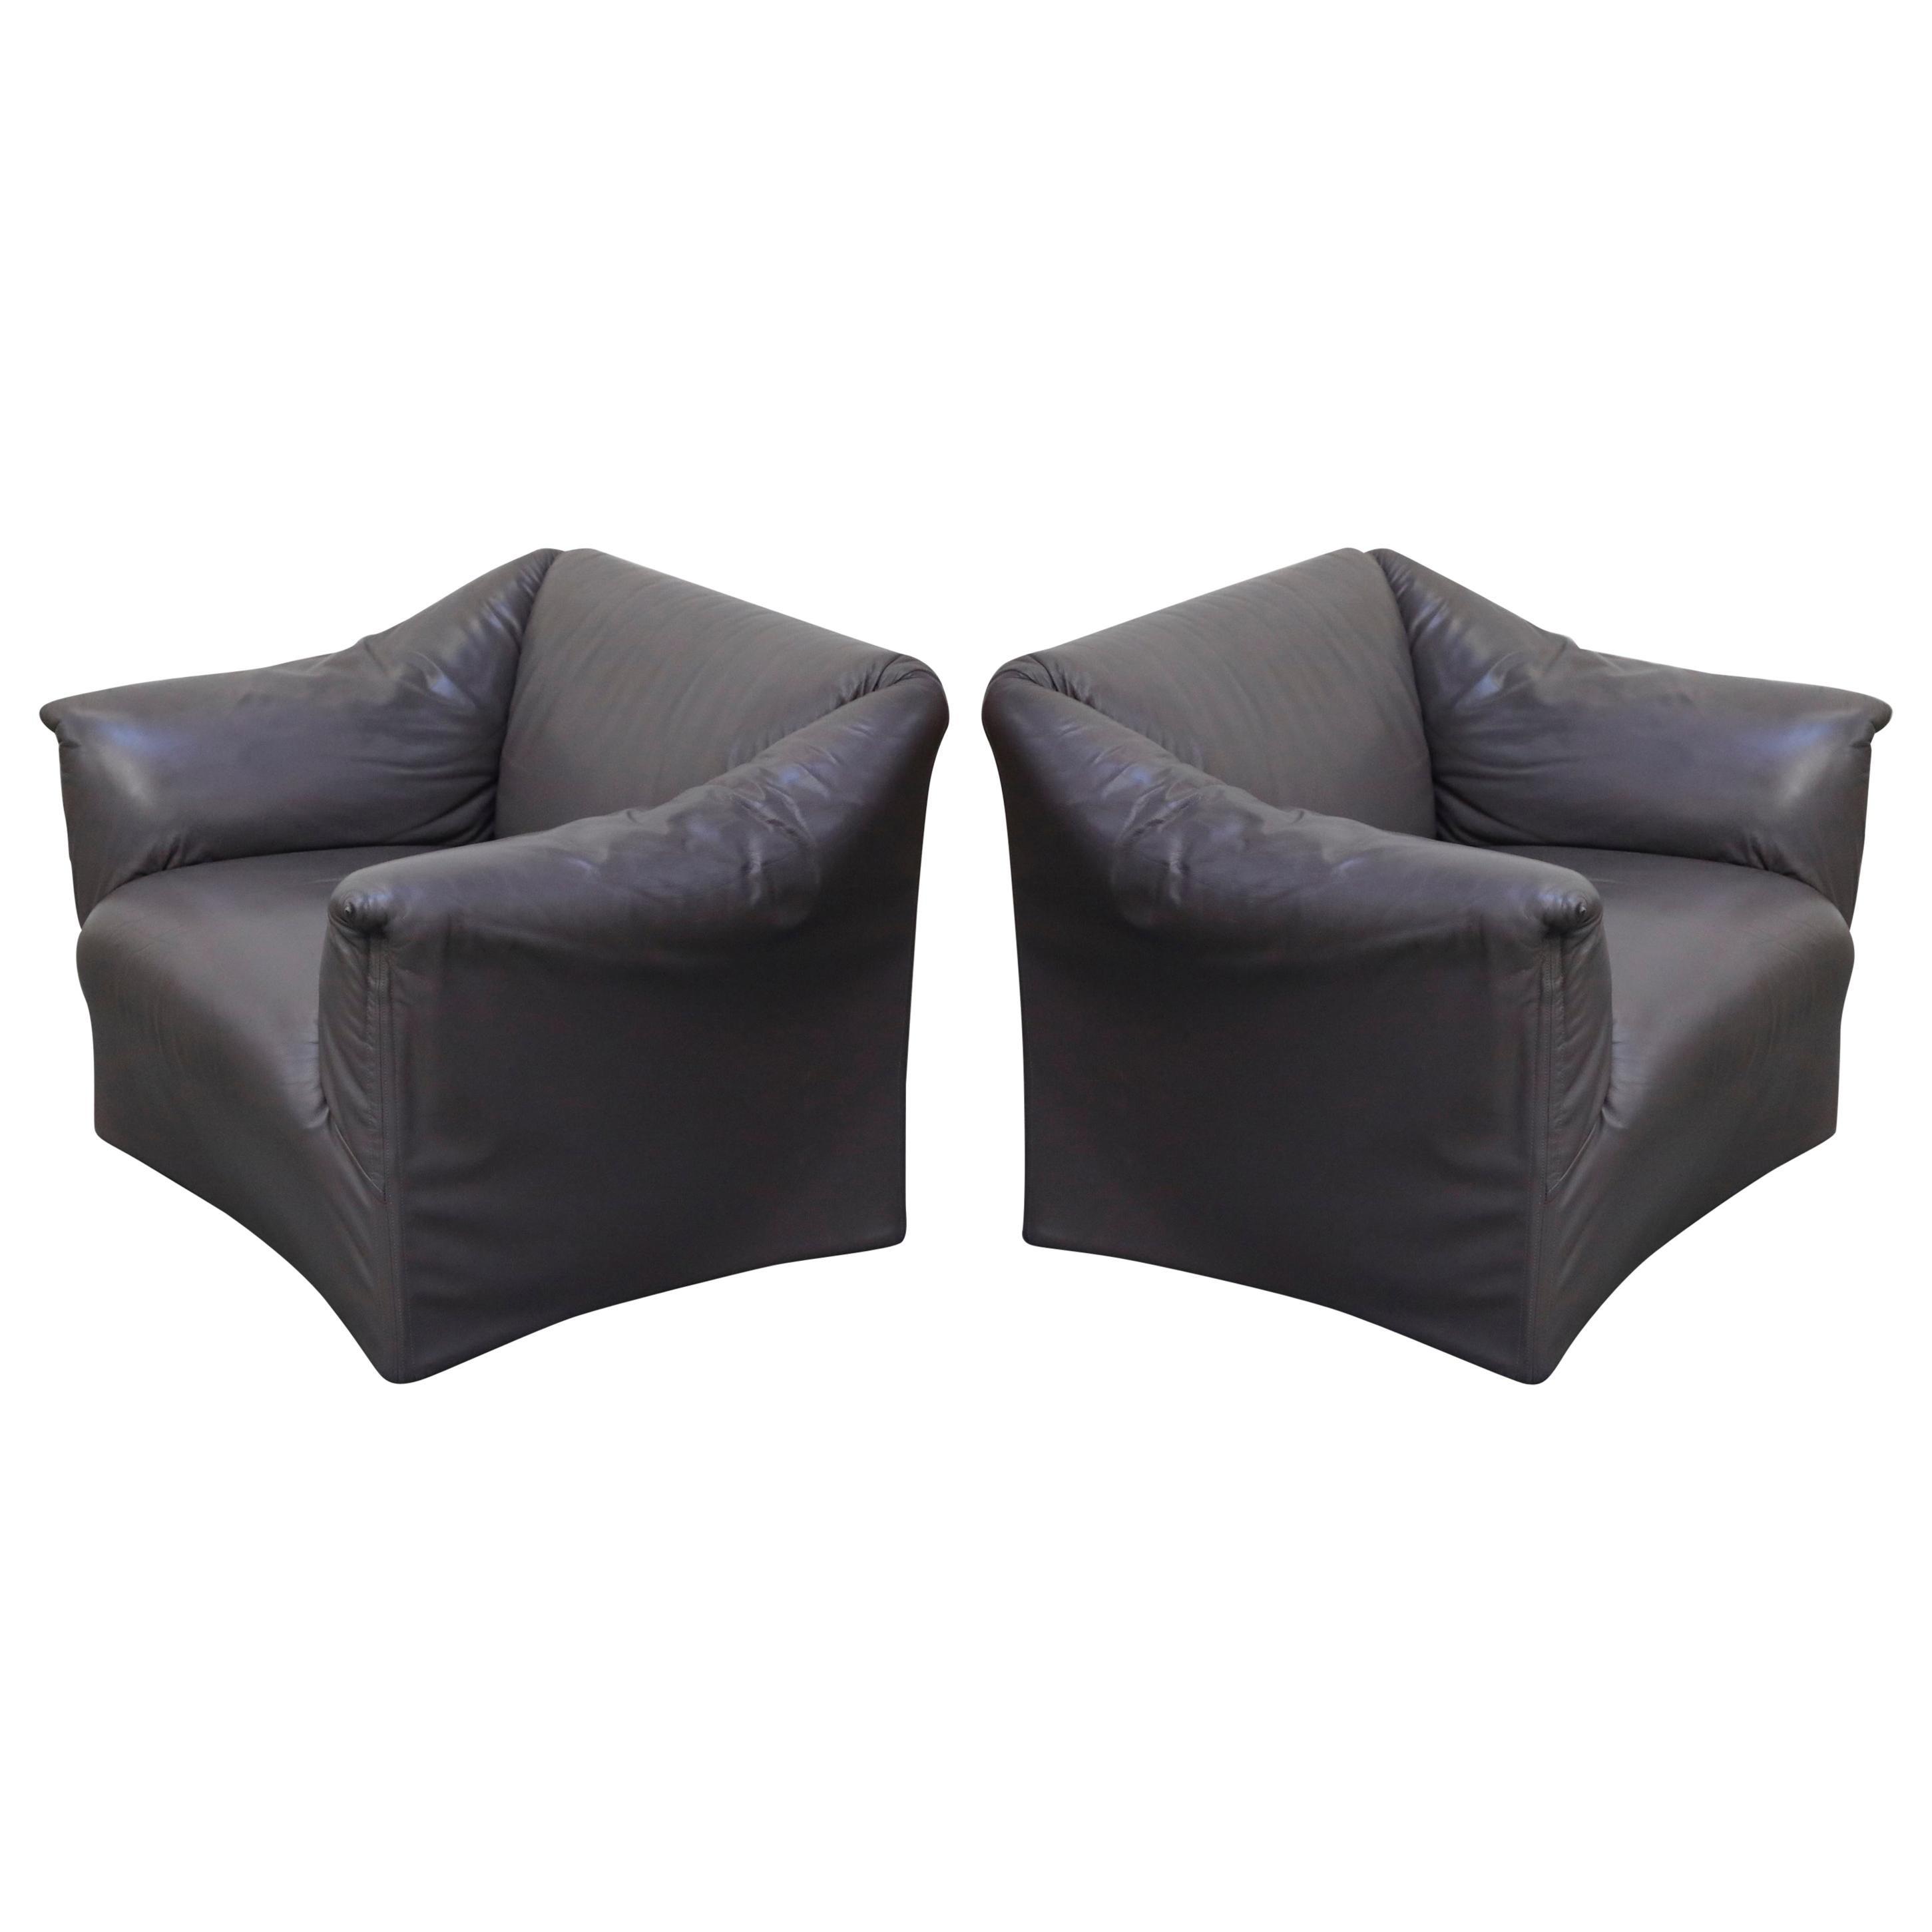 Mario Bellini Model 685 'Tentazione' Club Lounge Chairs in Leather, Signed